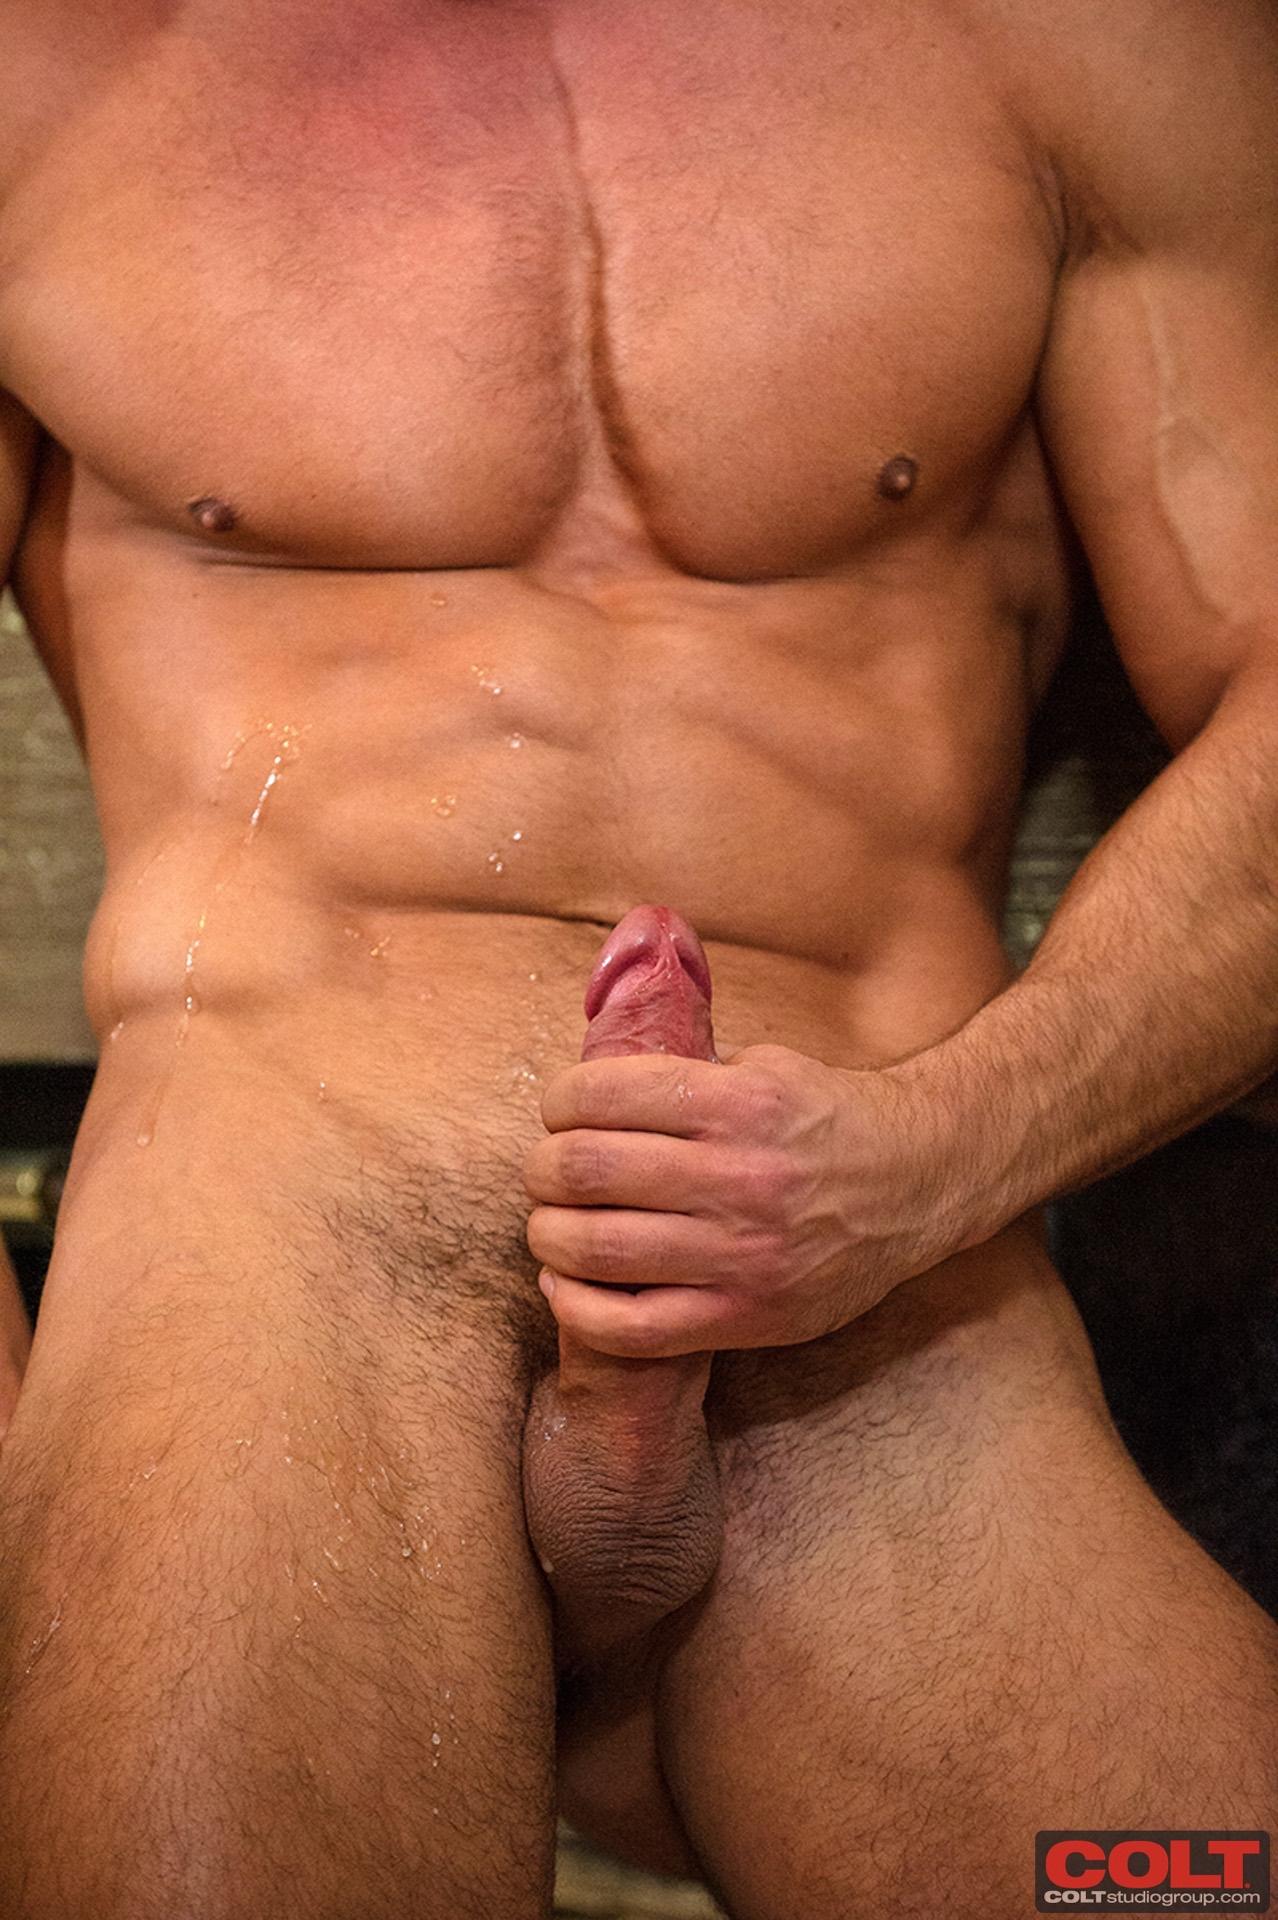 Buck santiago nude